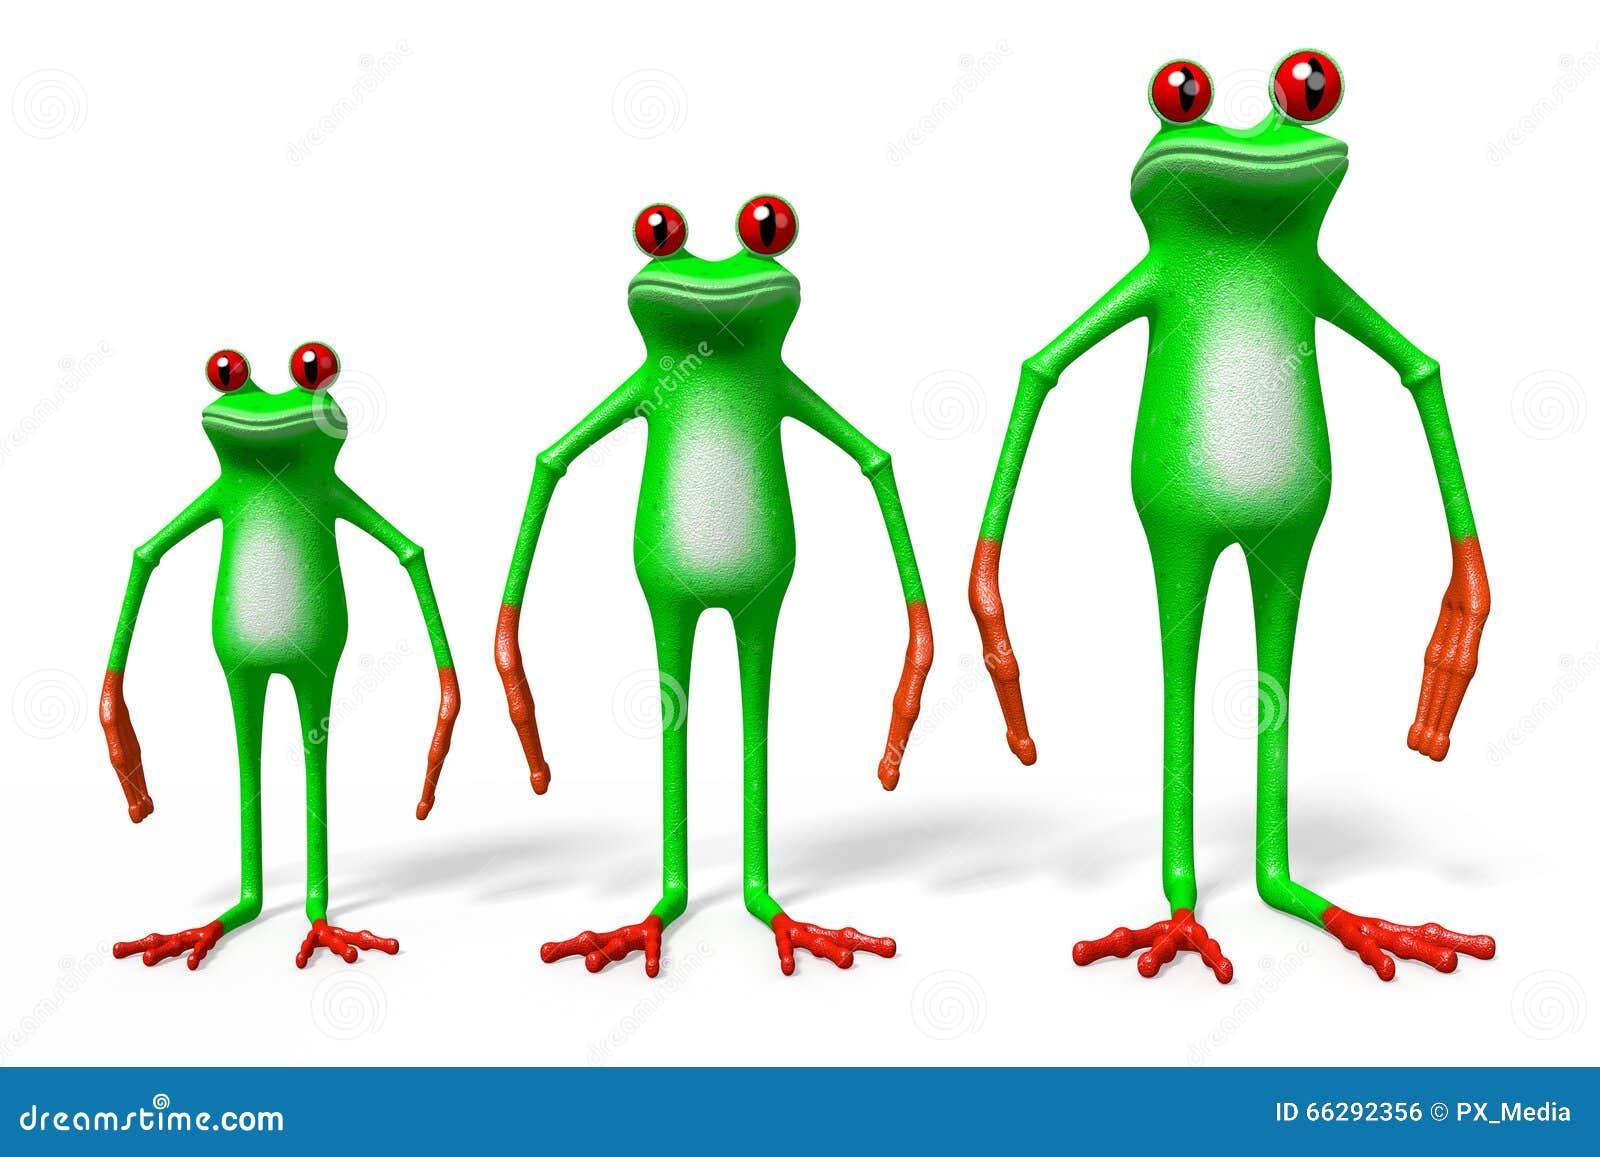 Download 3D Cartoon Frogs - Dimensions Concept Stock Illustration - Illustration of rainforest, nature: 66292356